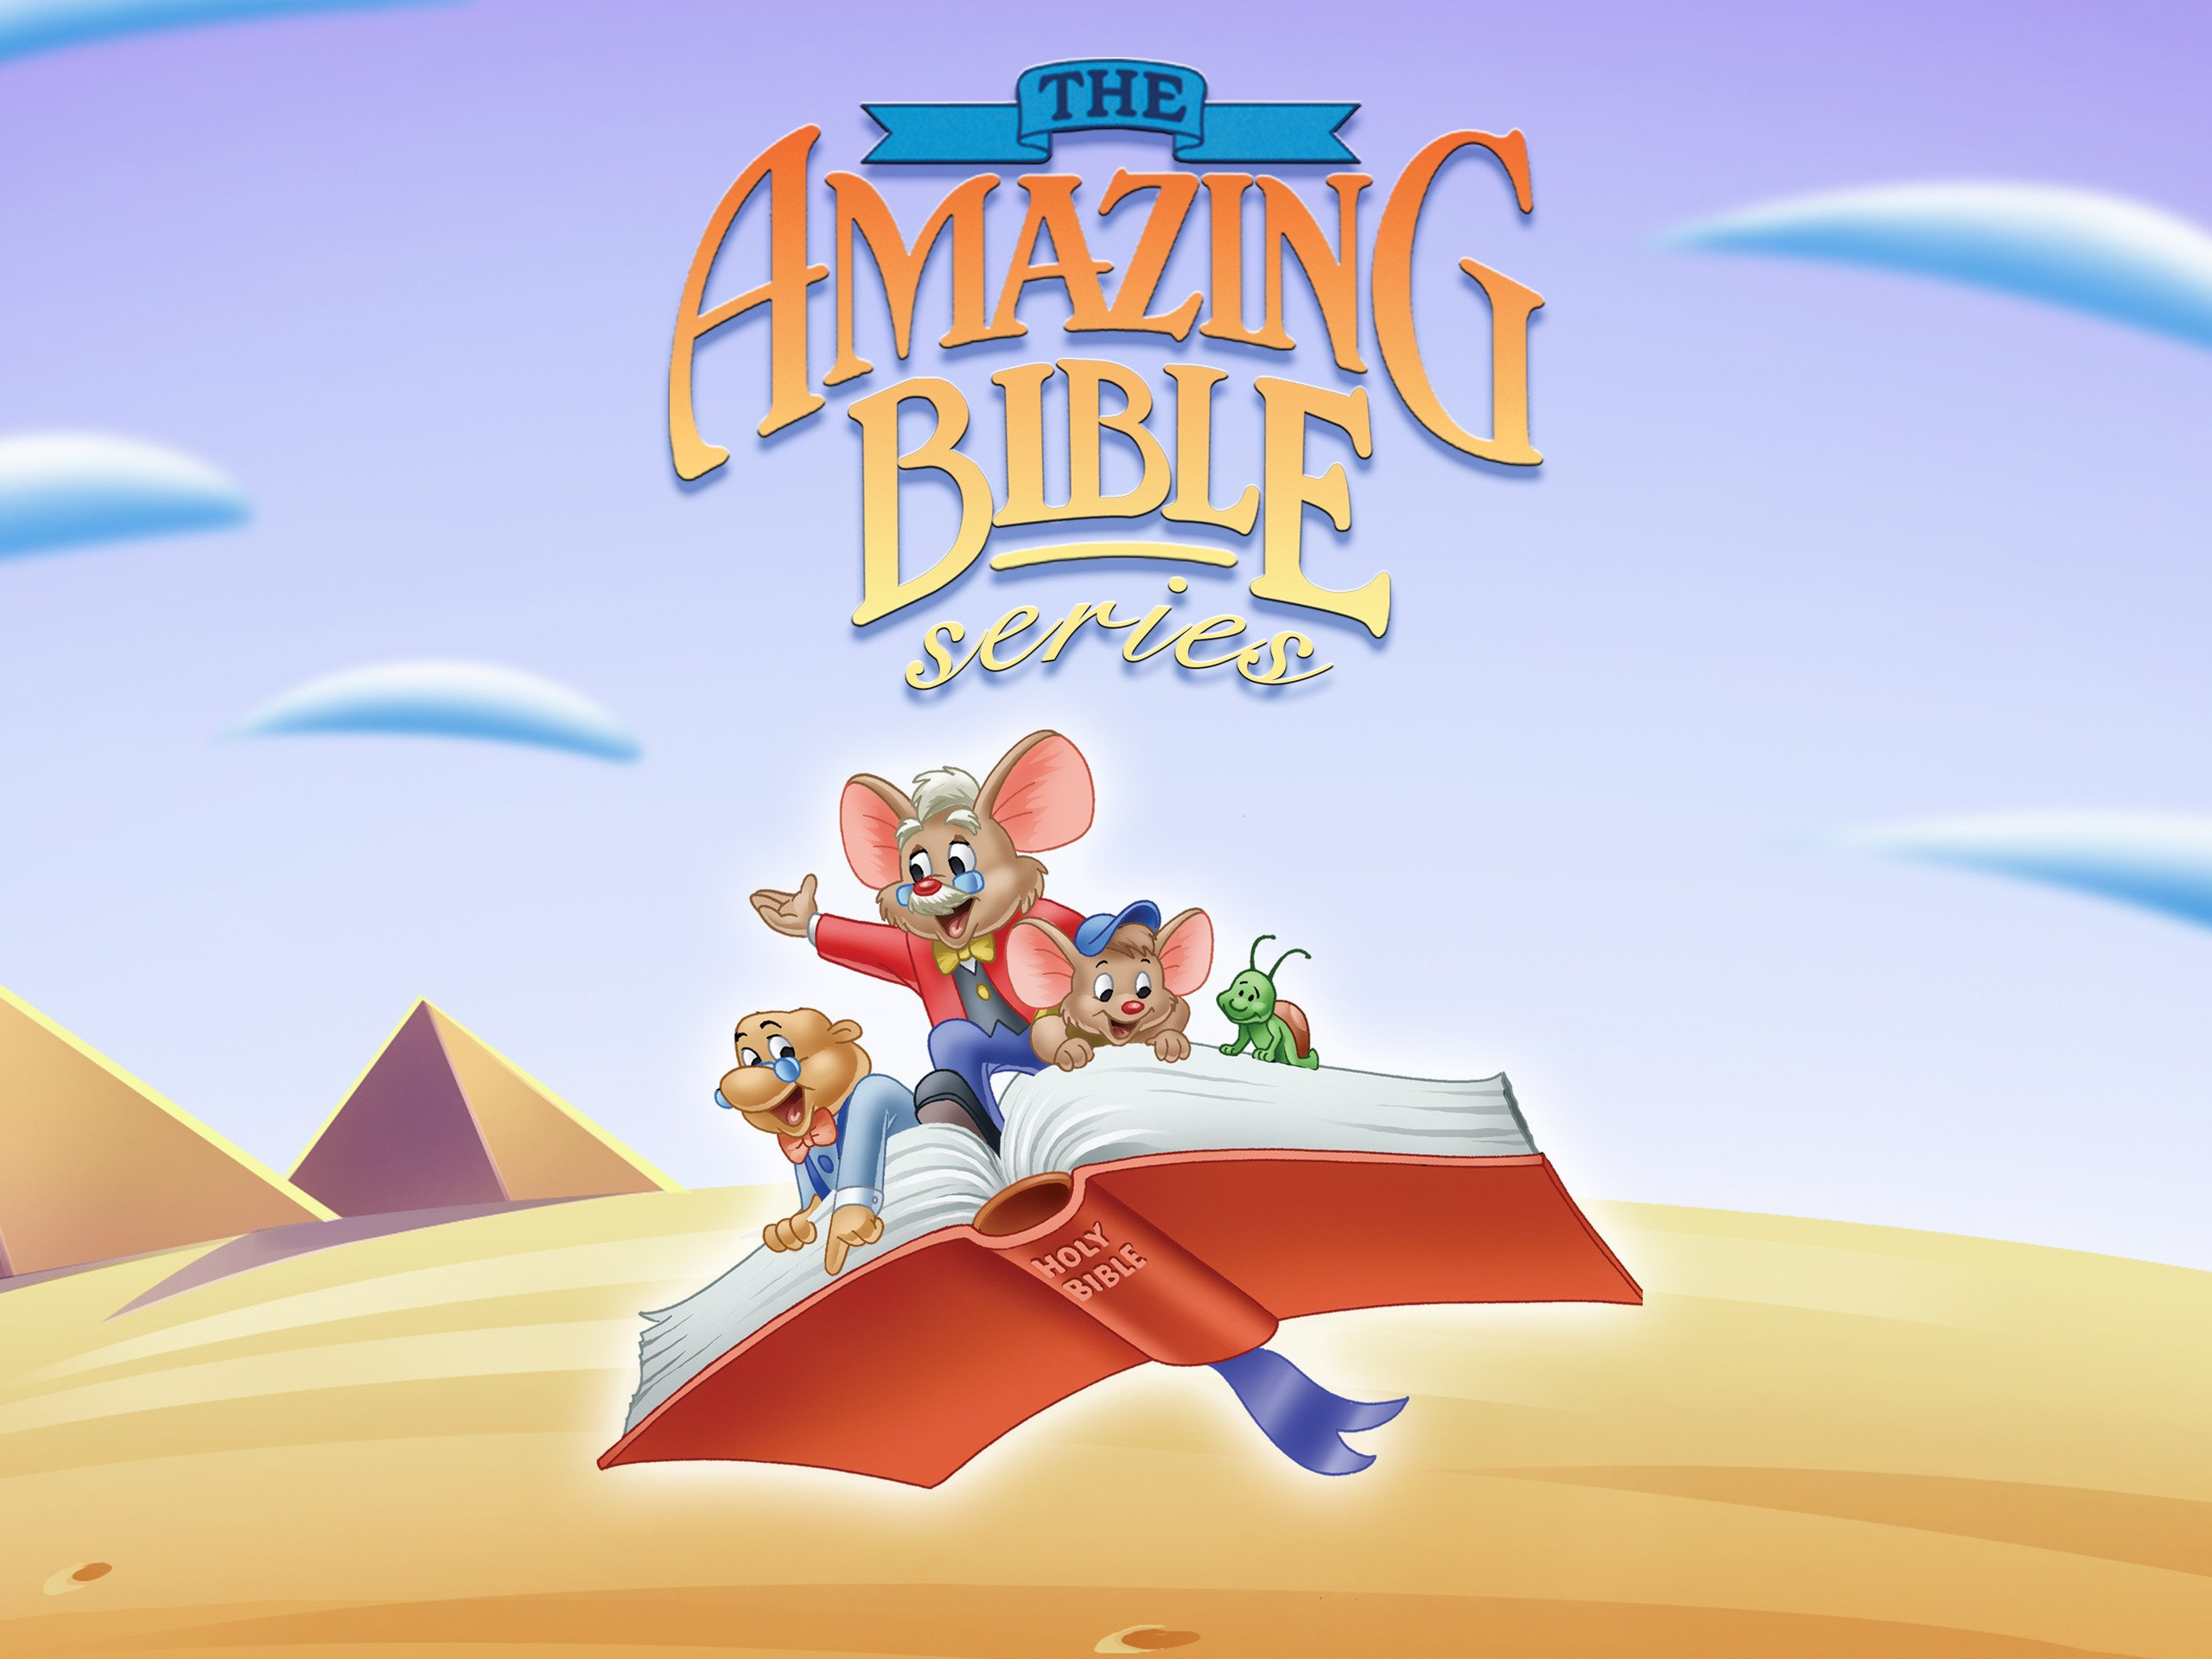 The Amazing Bible Series - Season 1